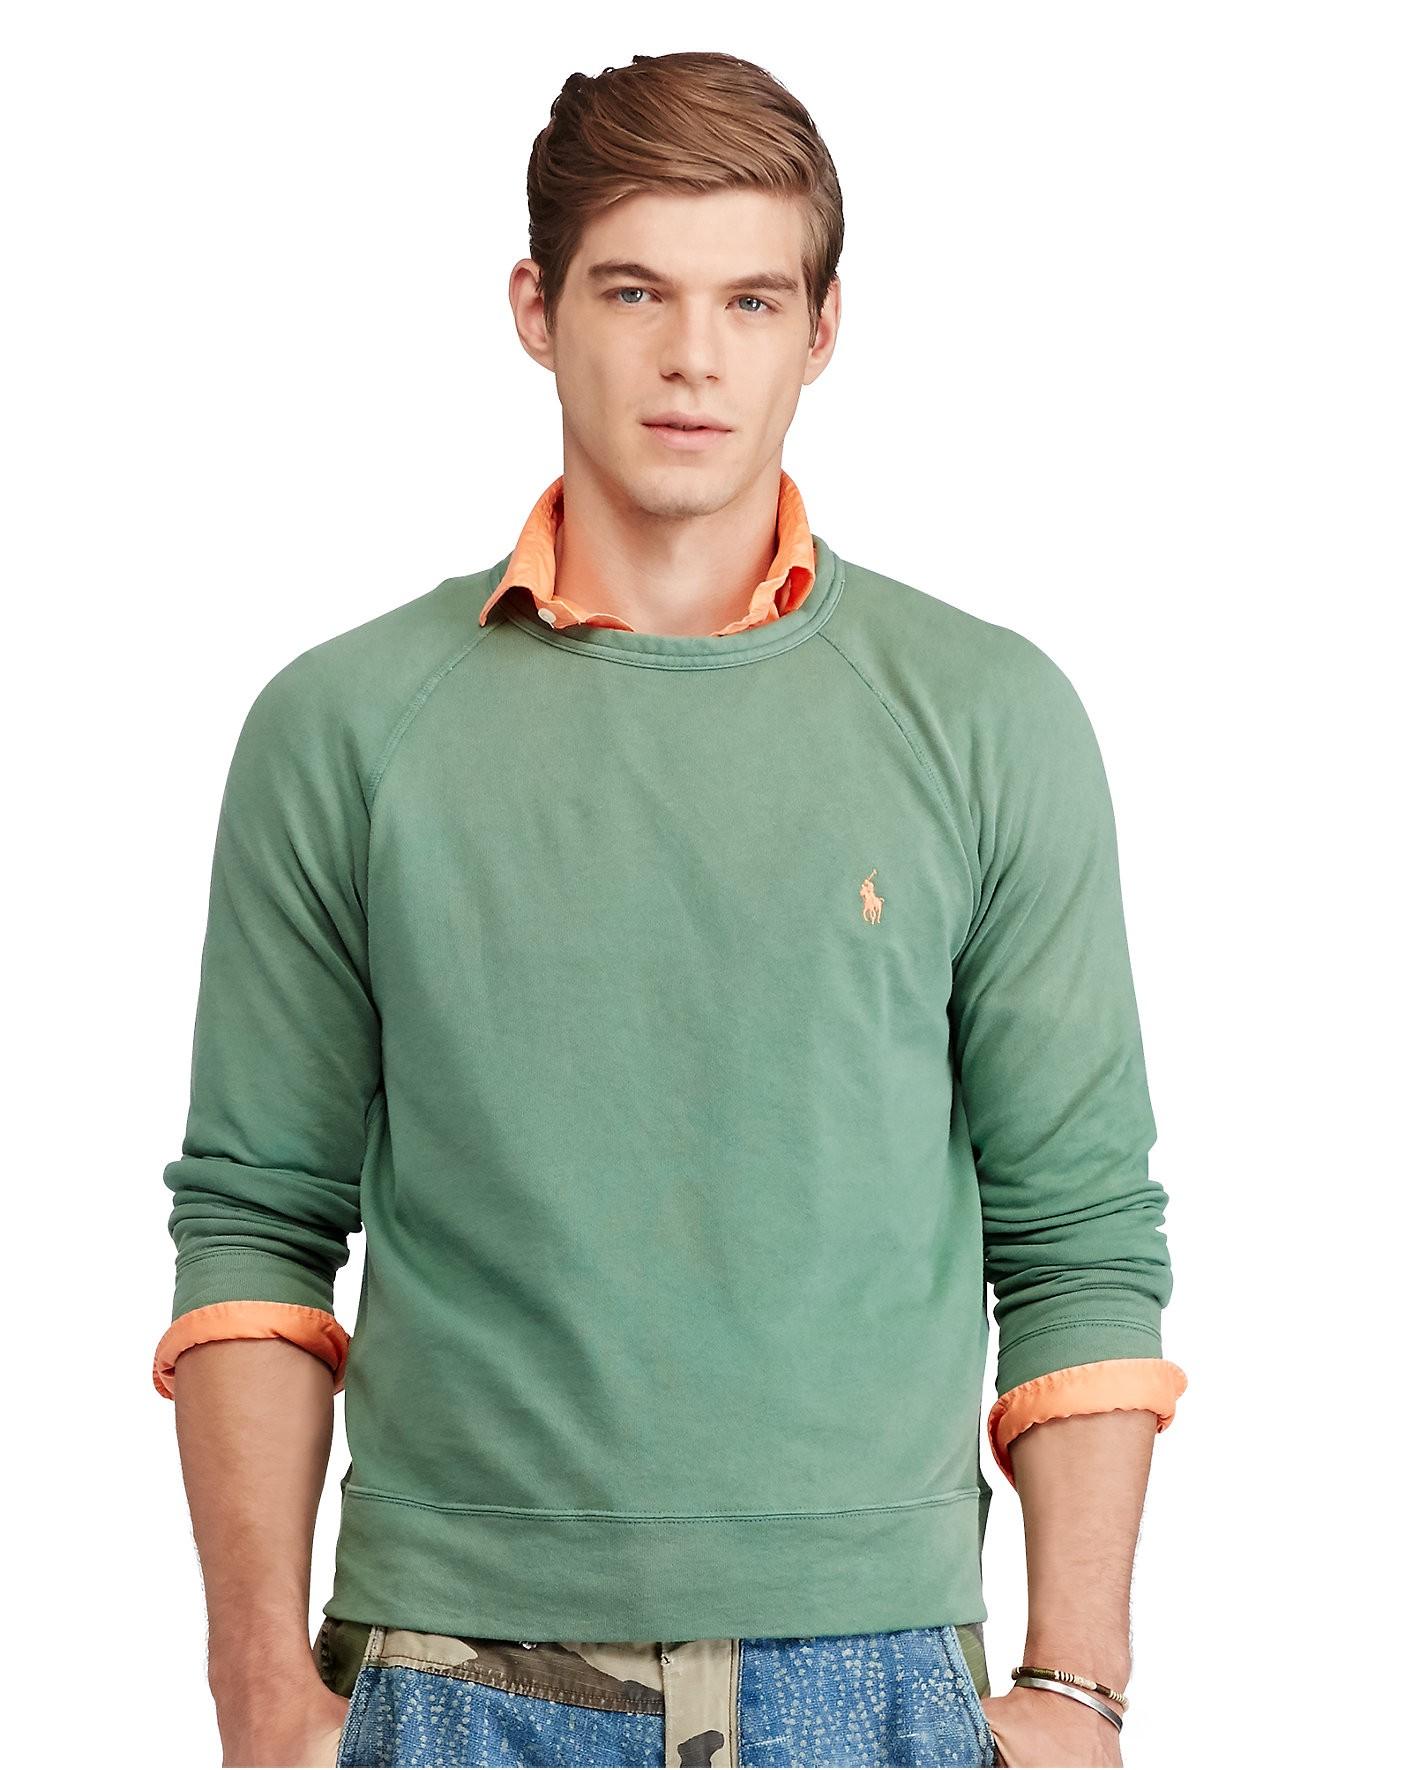 9823a9bac Polo Ralph Lauren Cotton Spa Terry Sweatshirt In Antique Green ...